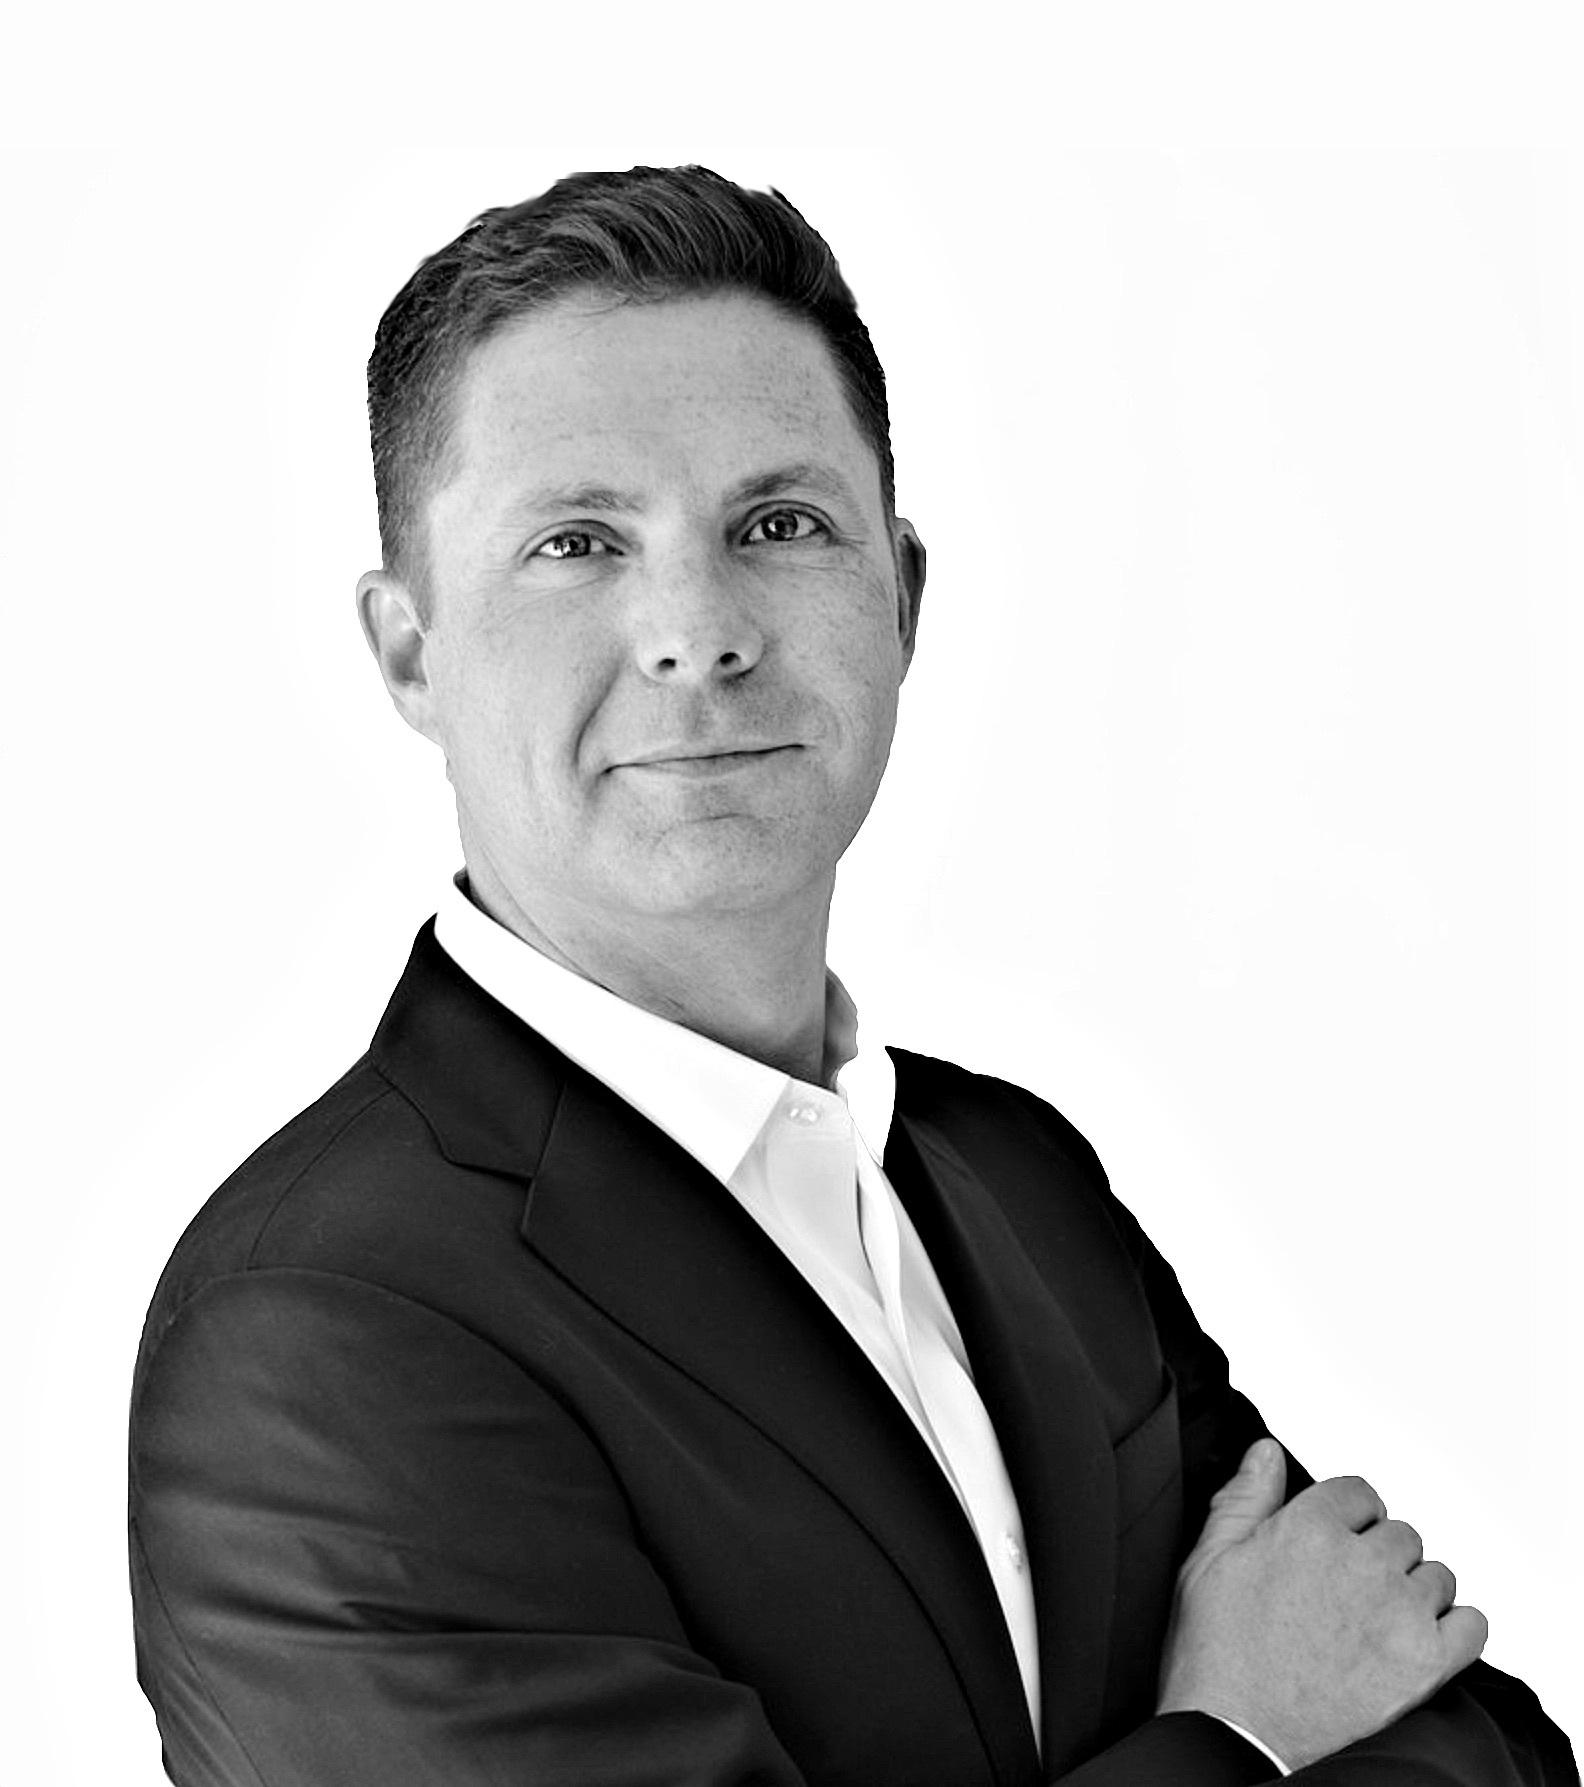 Kevin Smith, CMO